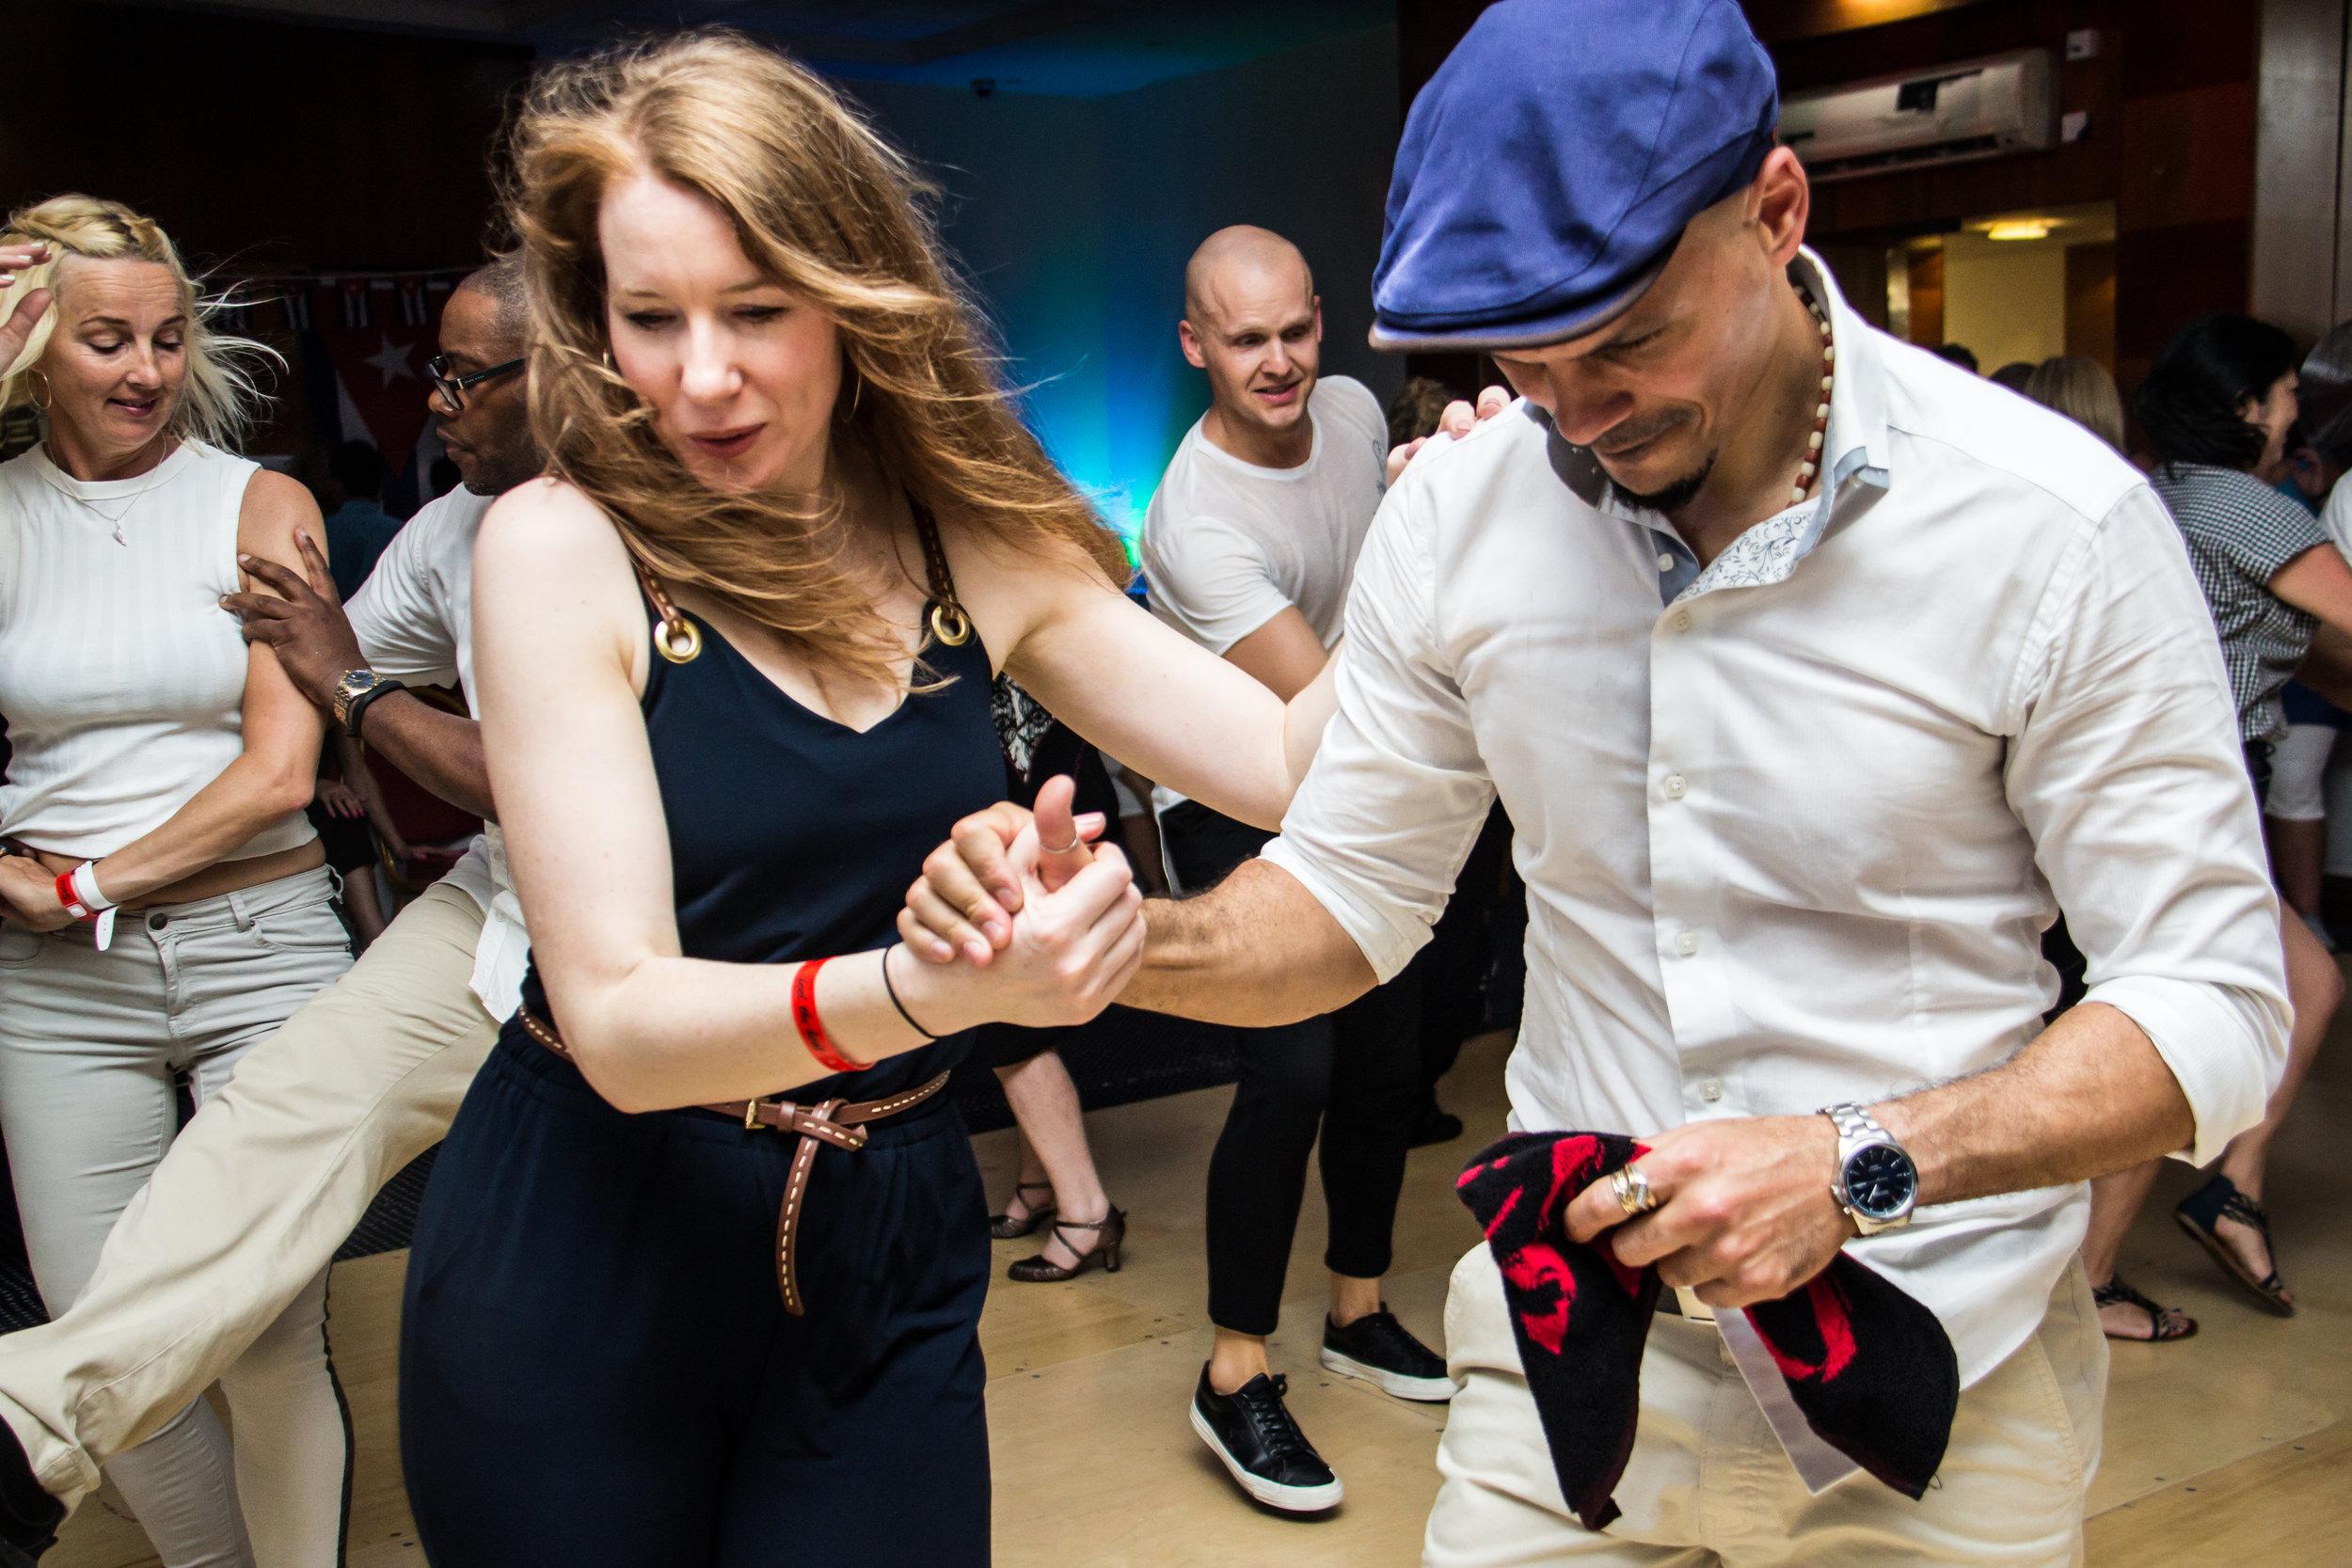 2019 07 05 salsa feel the heat friday party-62.jpg